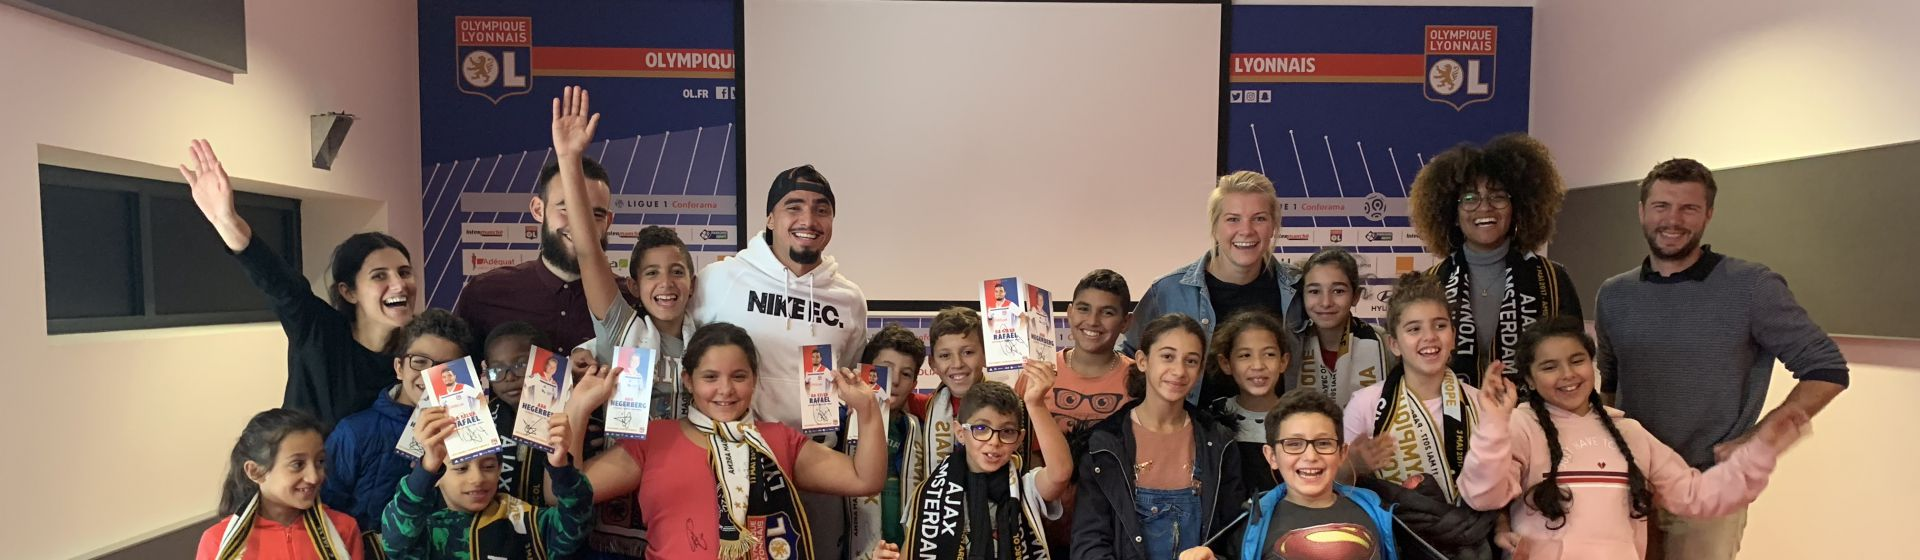 Ma Chance, Moi Aussi - Olympique Lyonnais Fondation